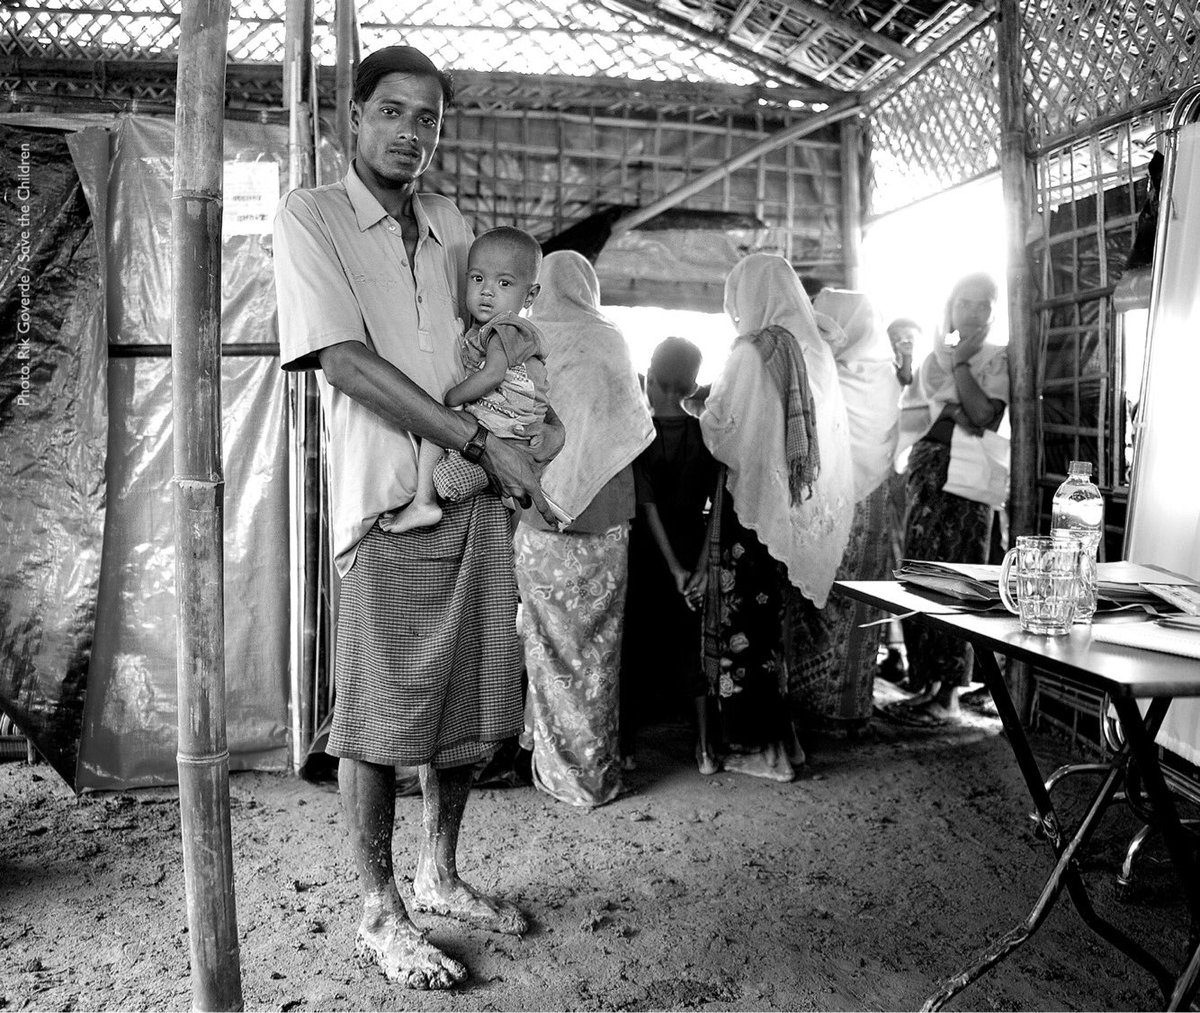 One ???? where we all ❤ our children. Please help. #Rohingya #Refugee @SavetheChildren  https://t.co/t2eJN244Jl https://t.co/9ZPwe5olJC